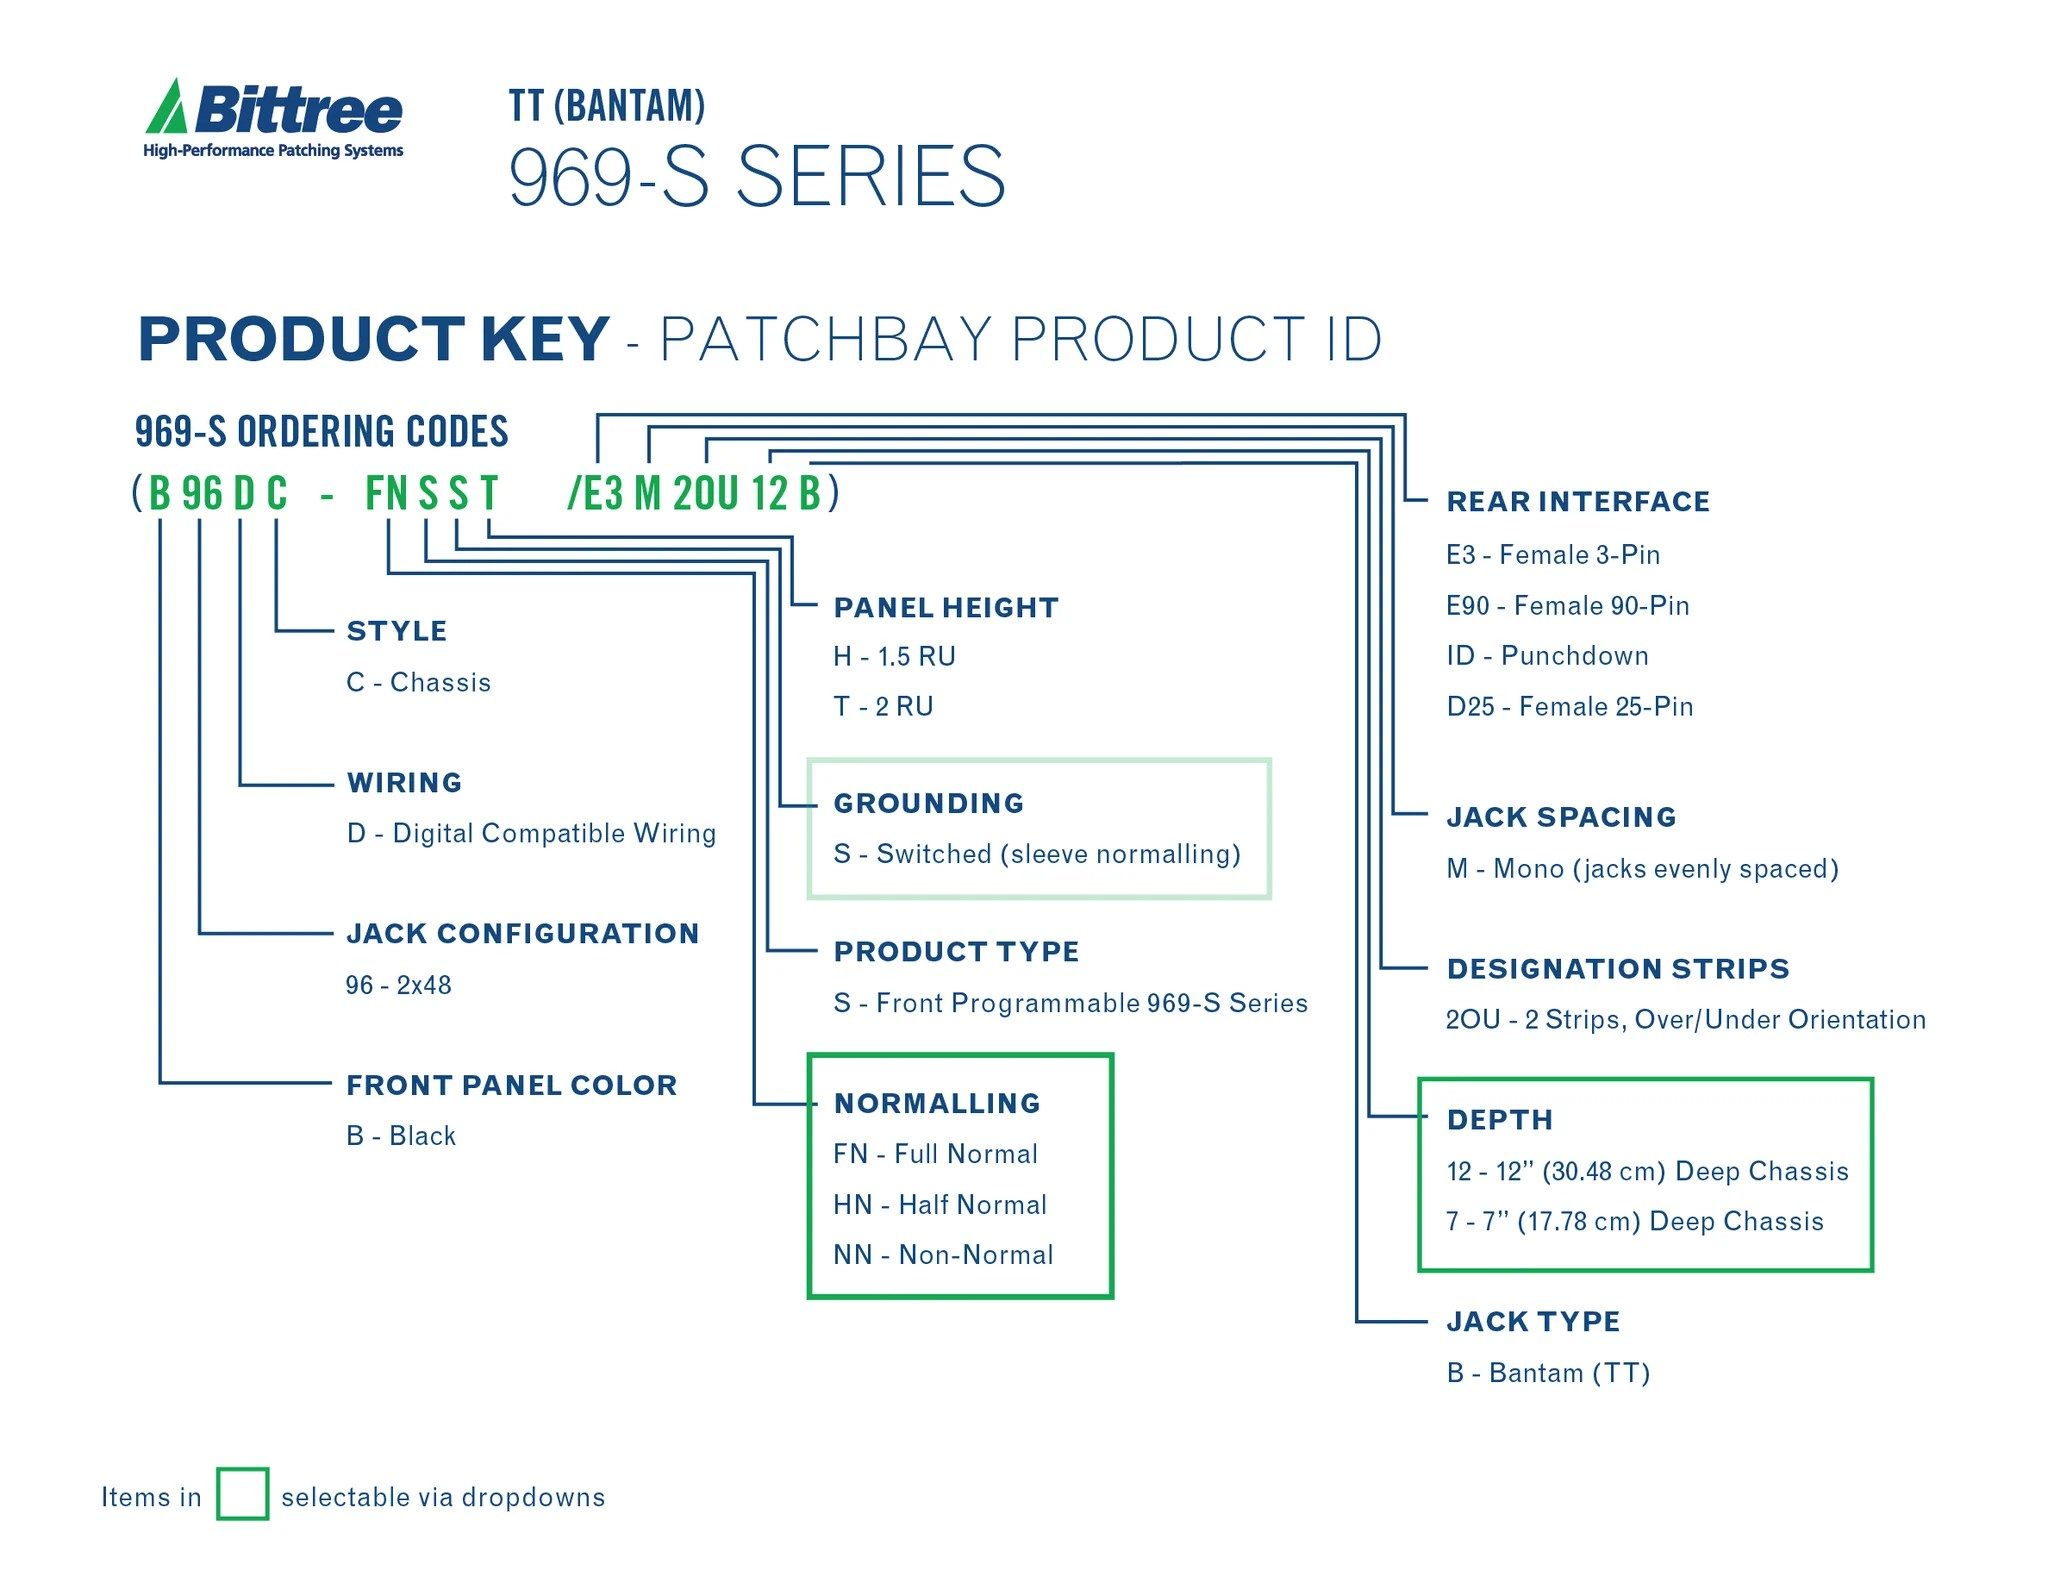 neutrik trs wiring diagram sony xplod deck patchbay circuit maker